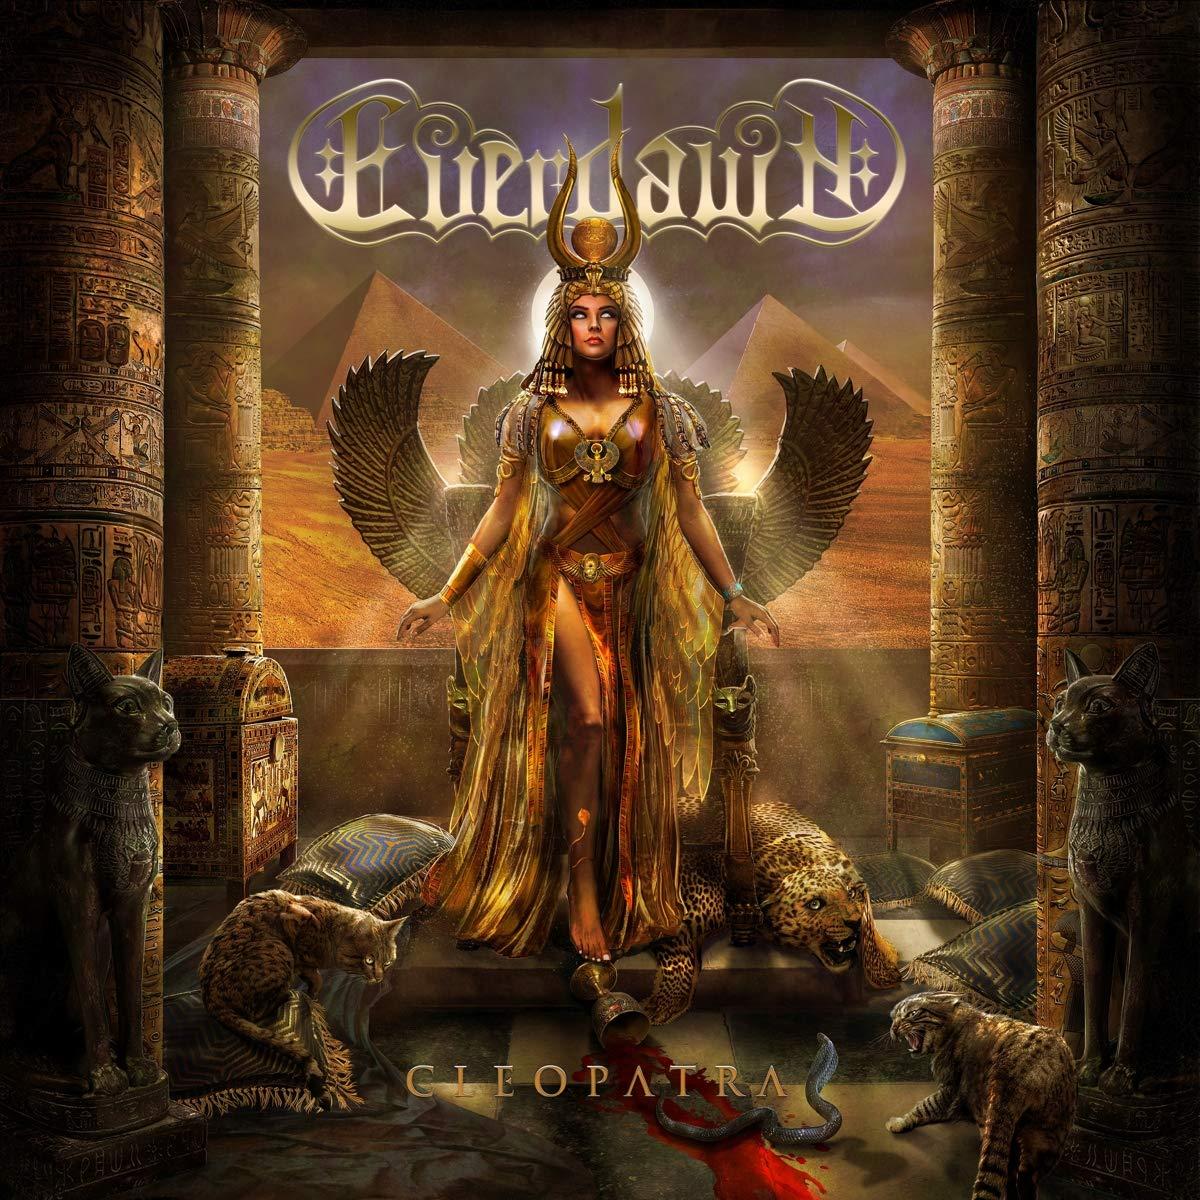 Everdawn – Cleopatra (2021) [FLAC]